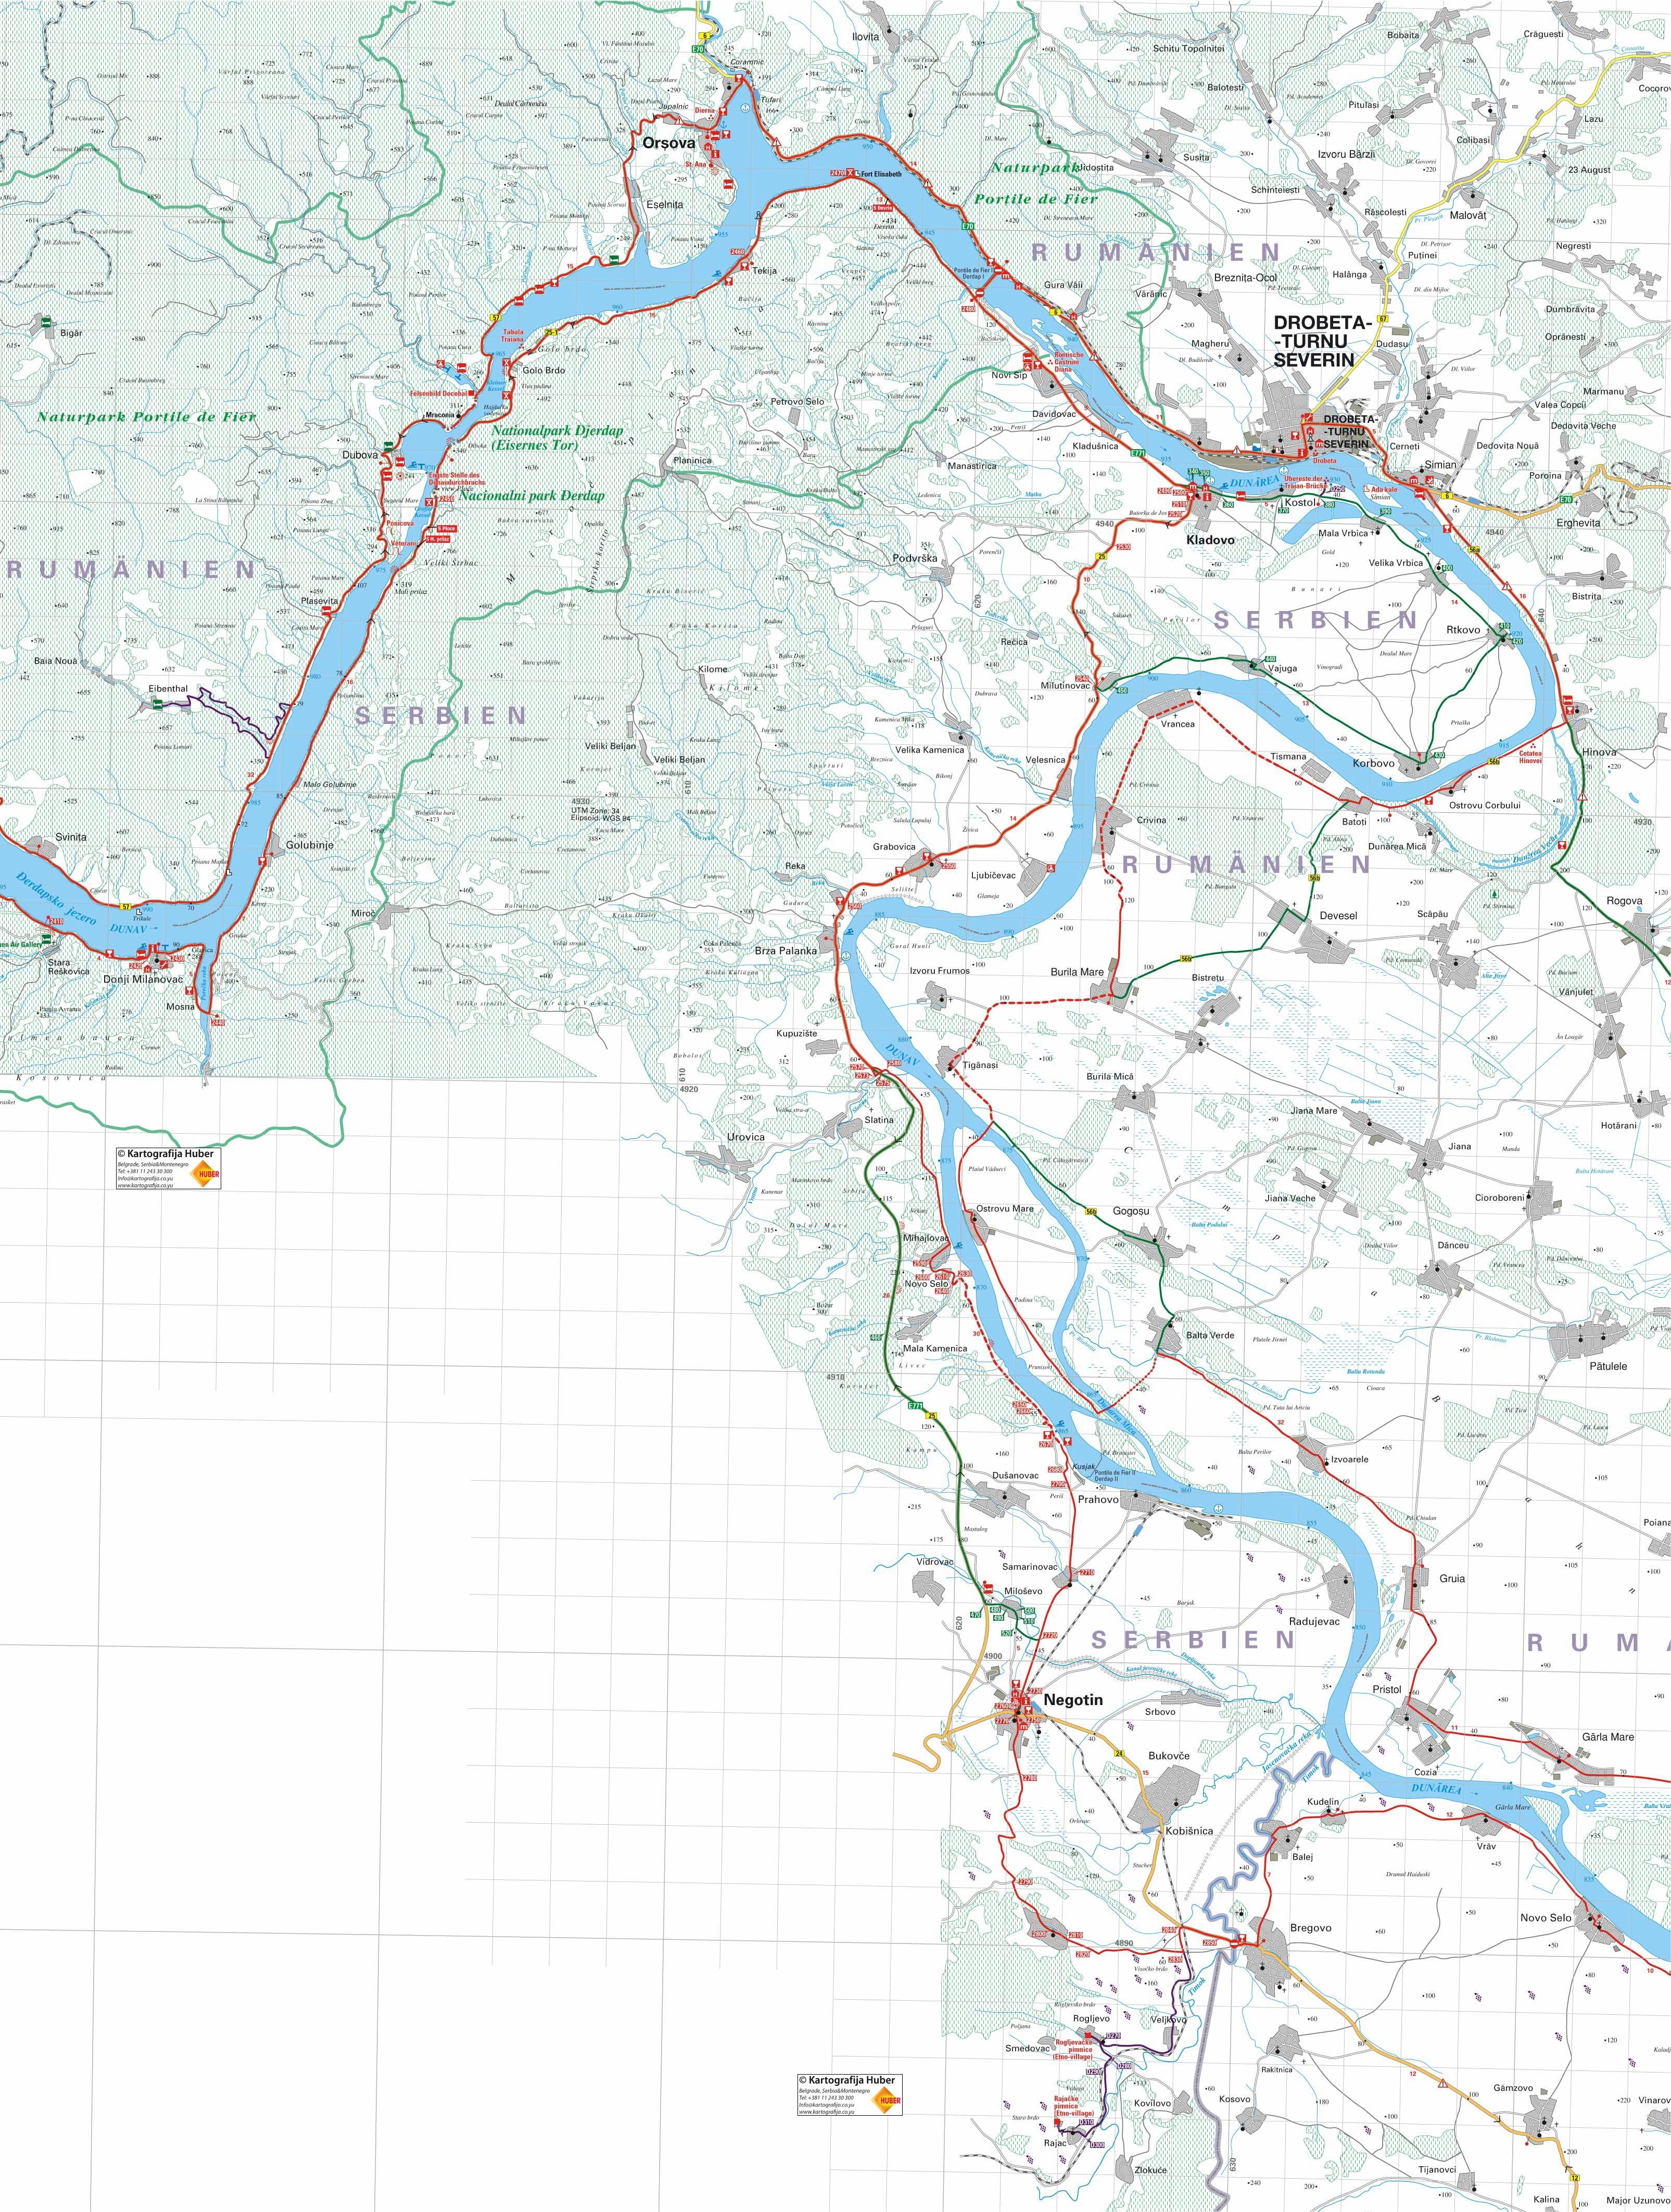 beograd kladovo mapa Dunav: deonica Donji Milanovac   Kladovo   Negotin   bugarska granica beograd kladovo mapa